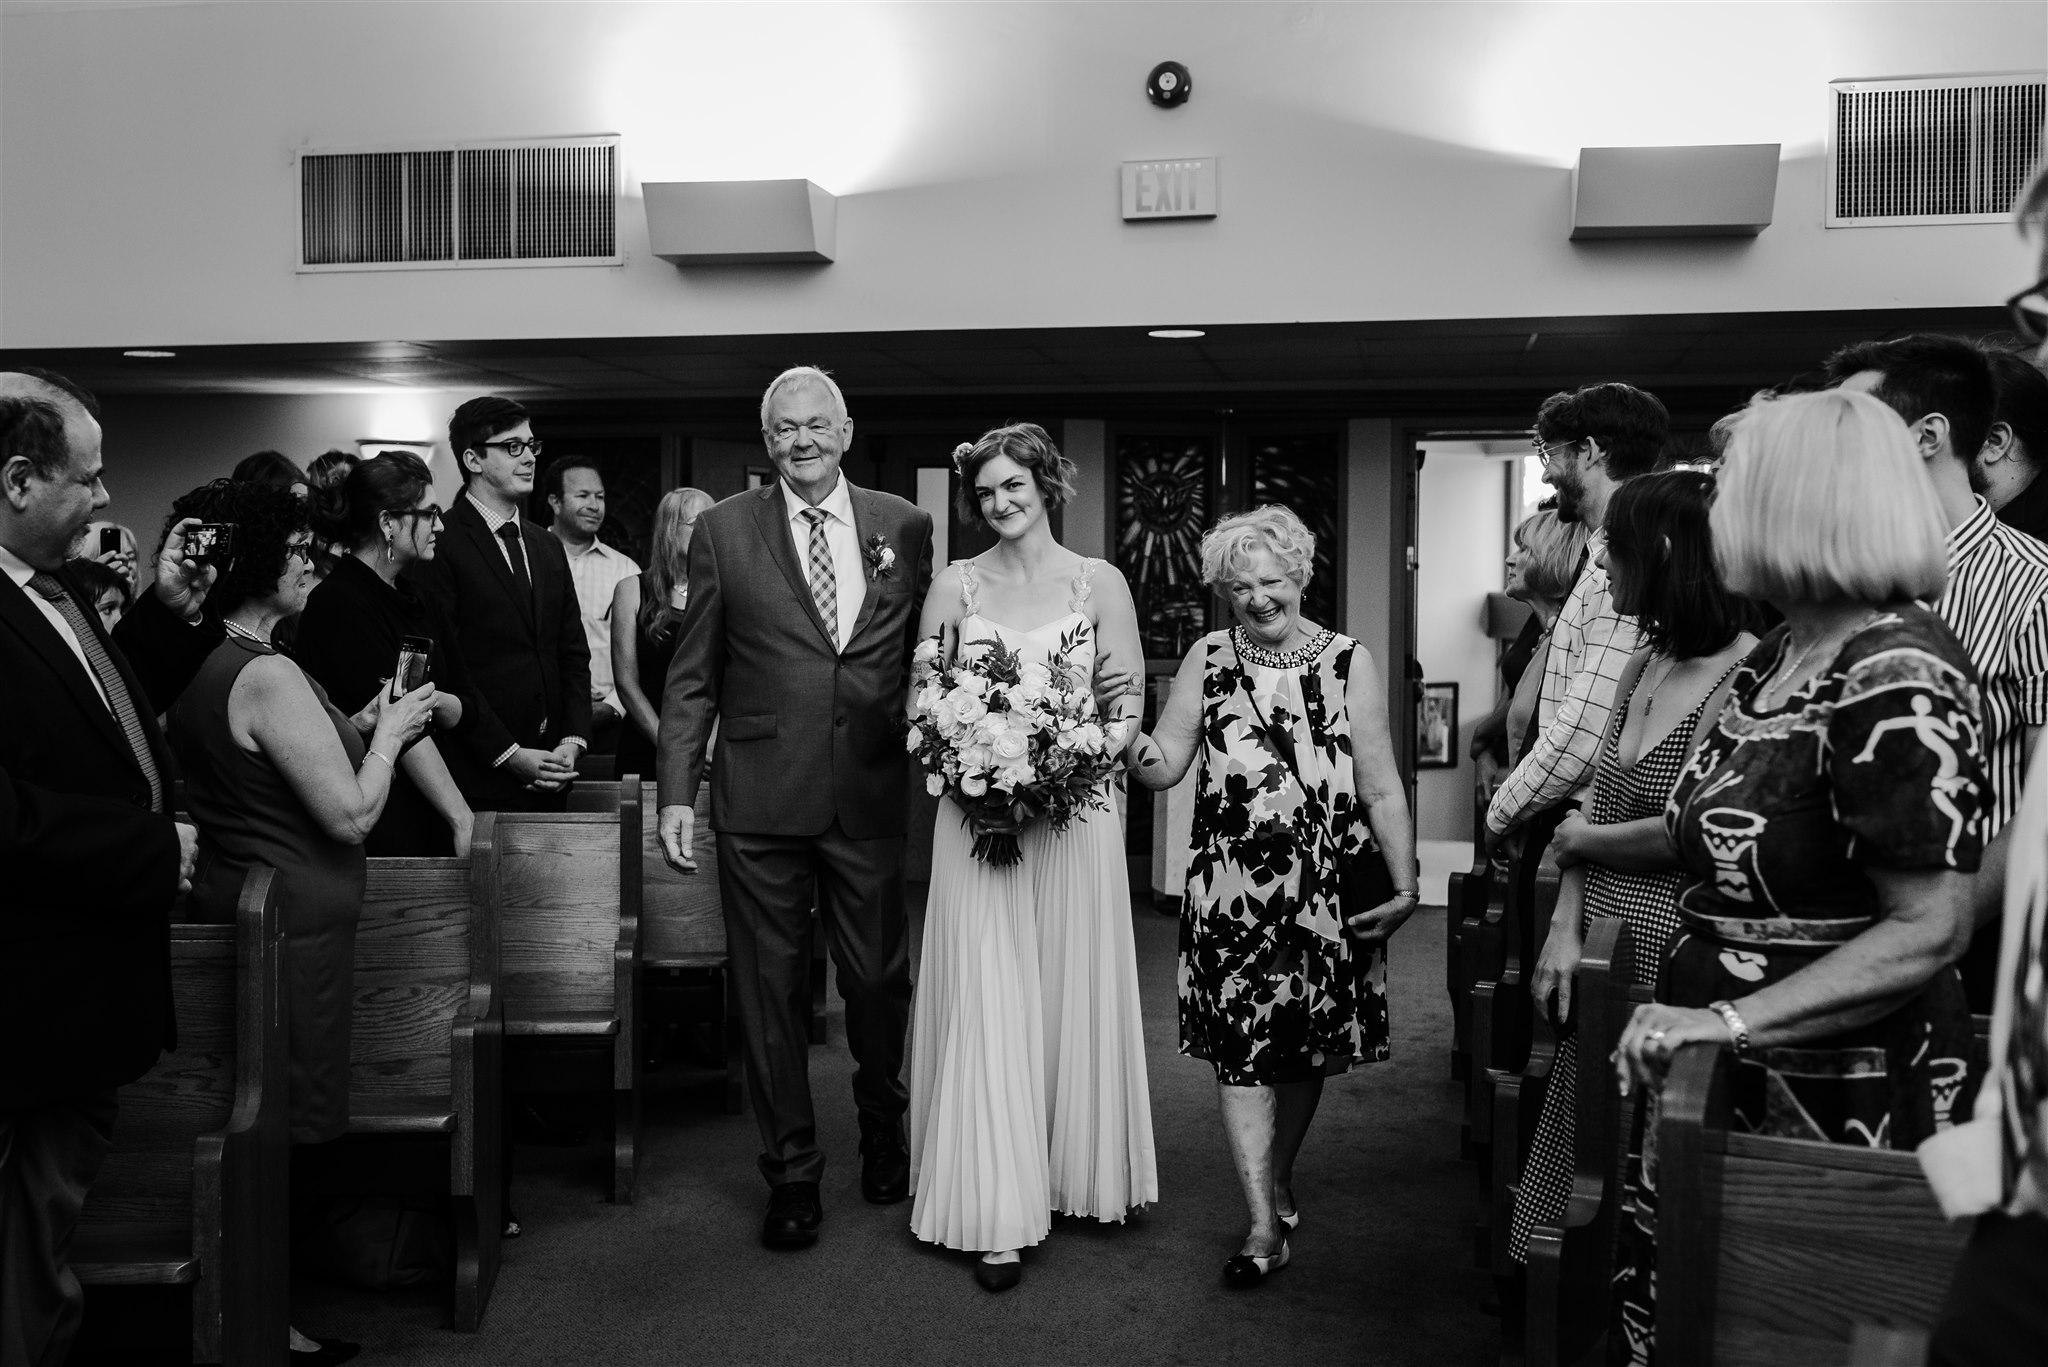 fanshawe conservation area wedding photos 113 1 - Watson Porter Pavillion Wedding